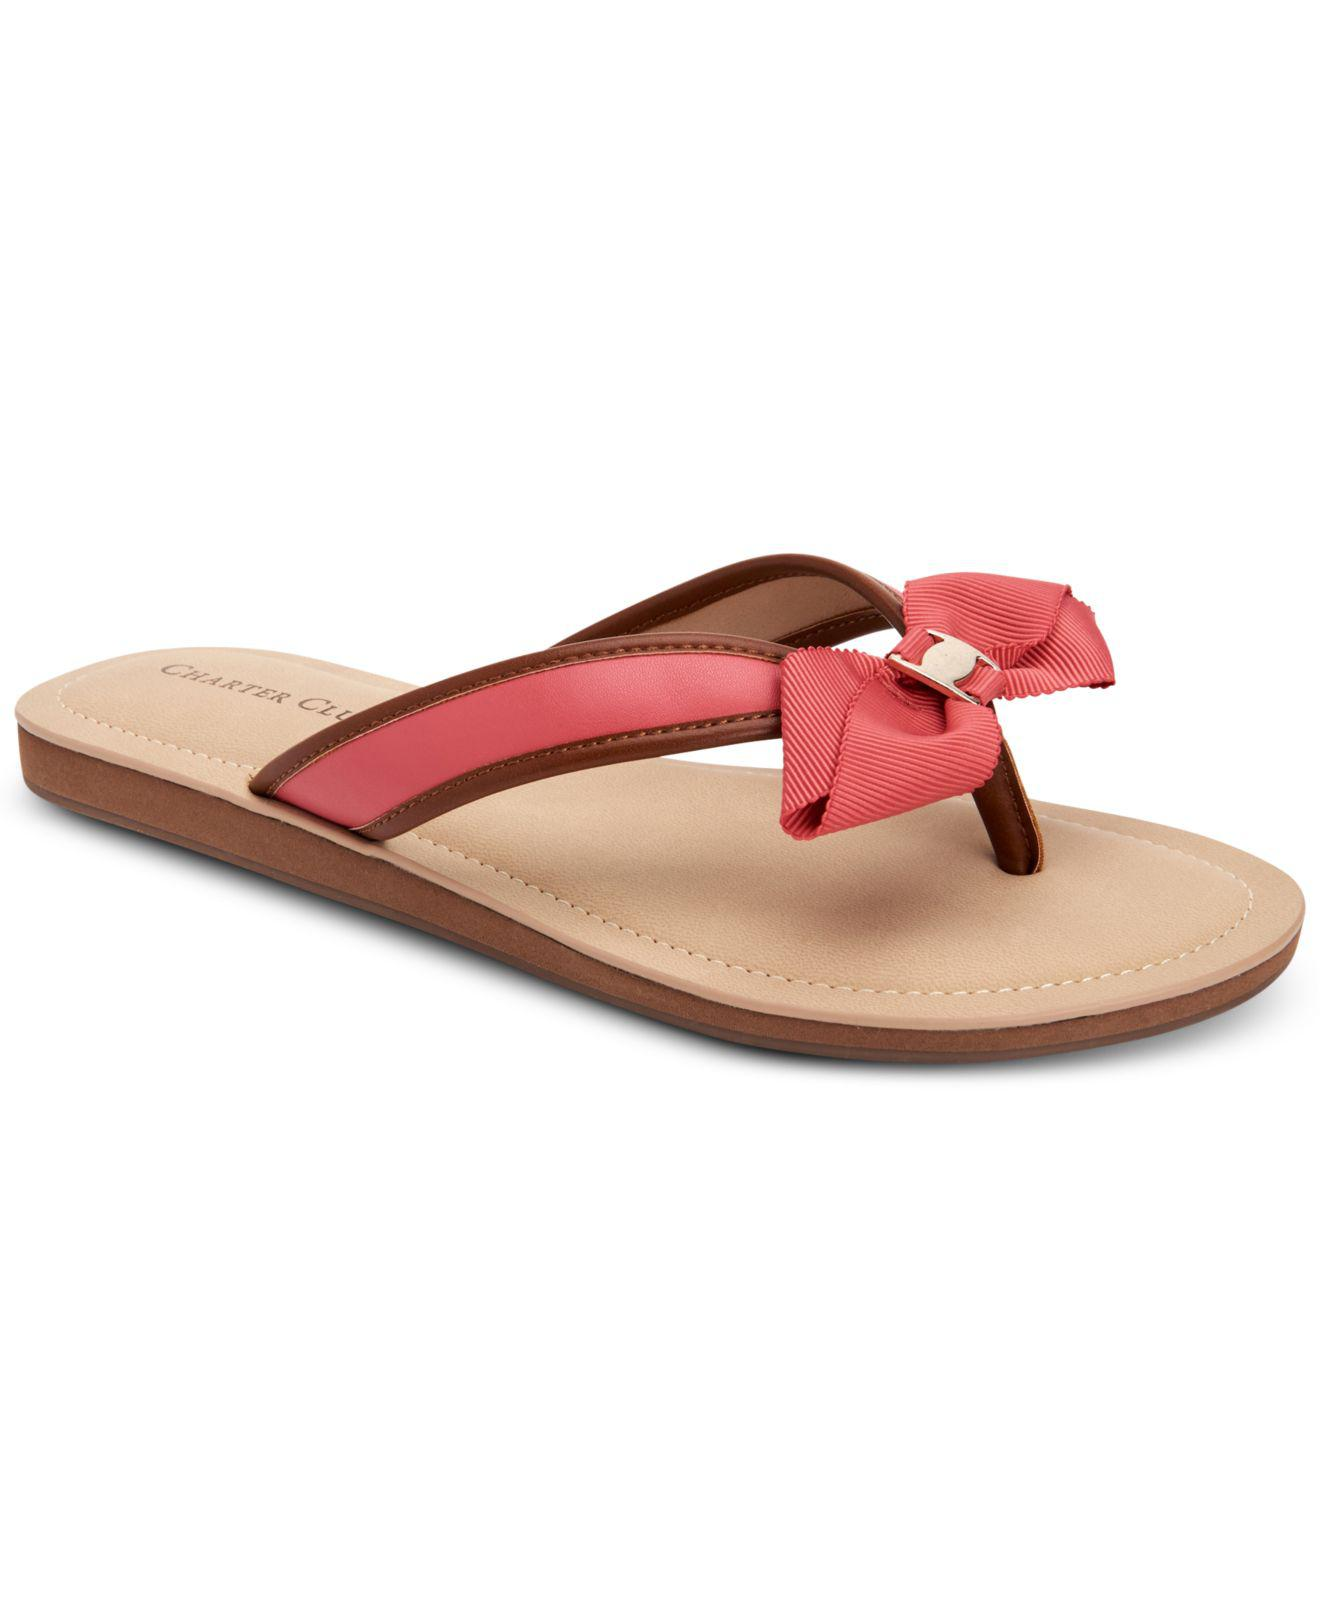 33b52774d126 Lyst - Charter Club Esmaraa Flip-flop Sandals